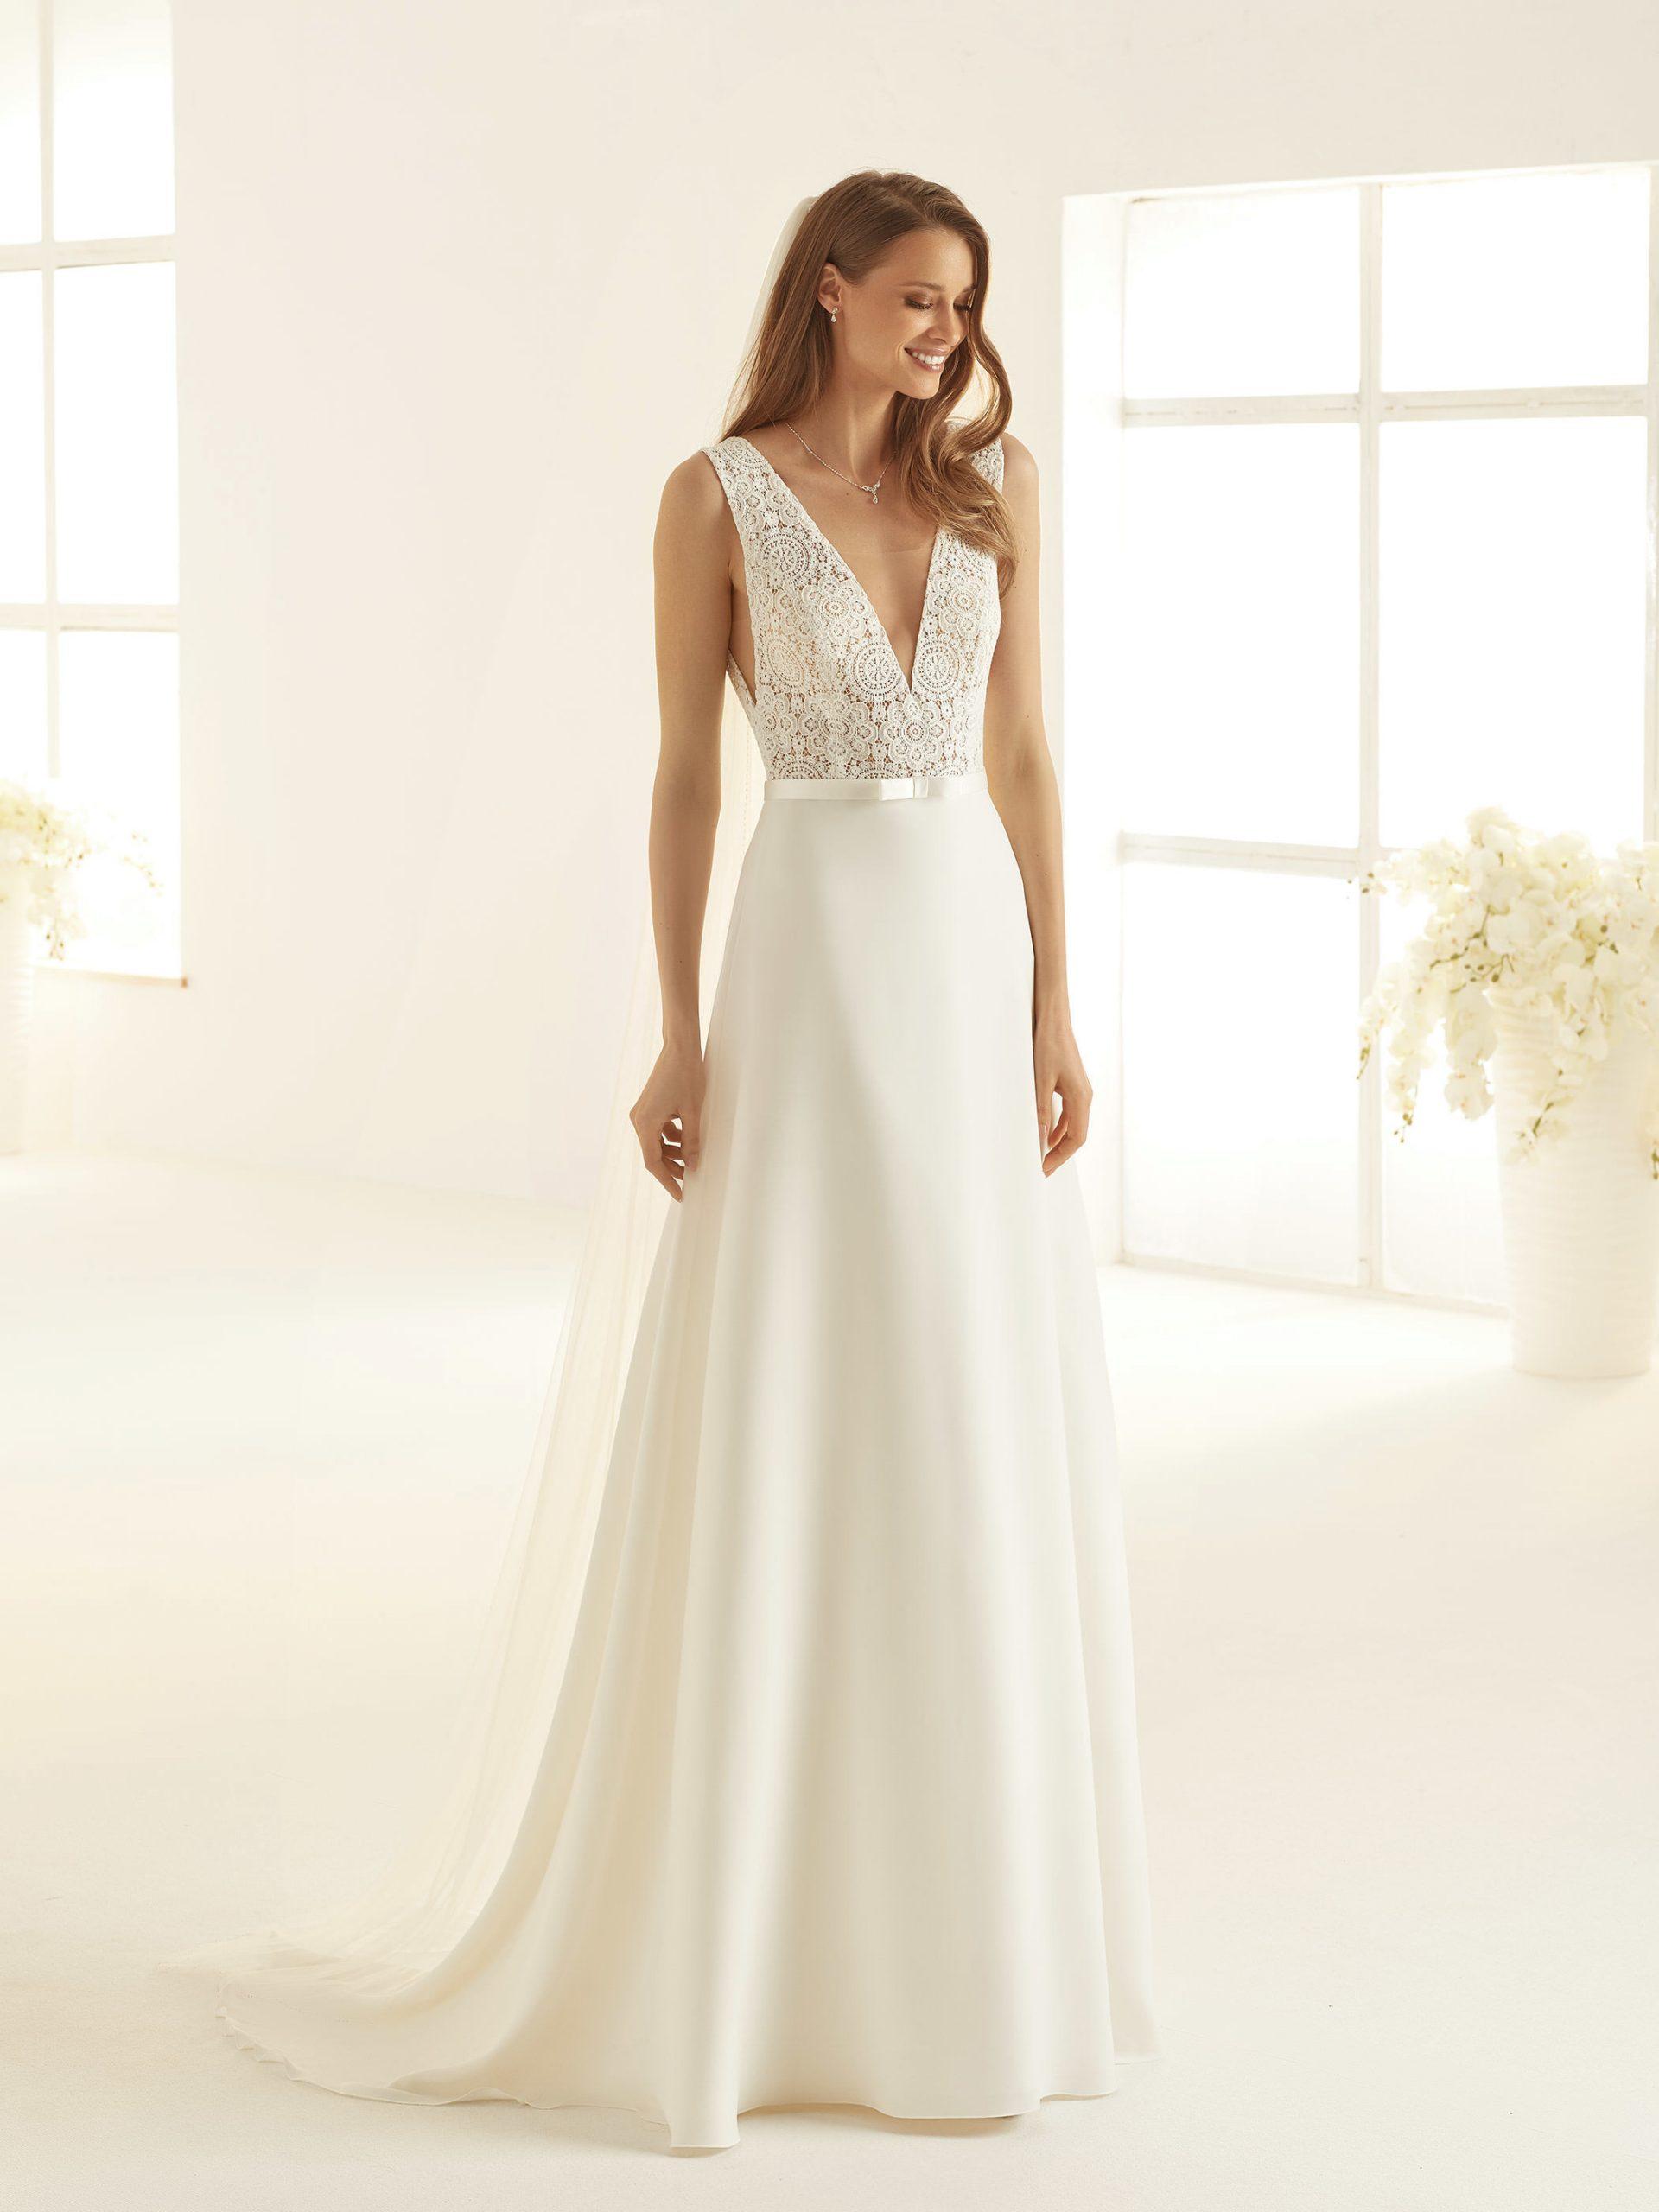 Hochzeitskleid Dallas  Samyra Fashion